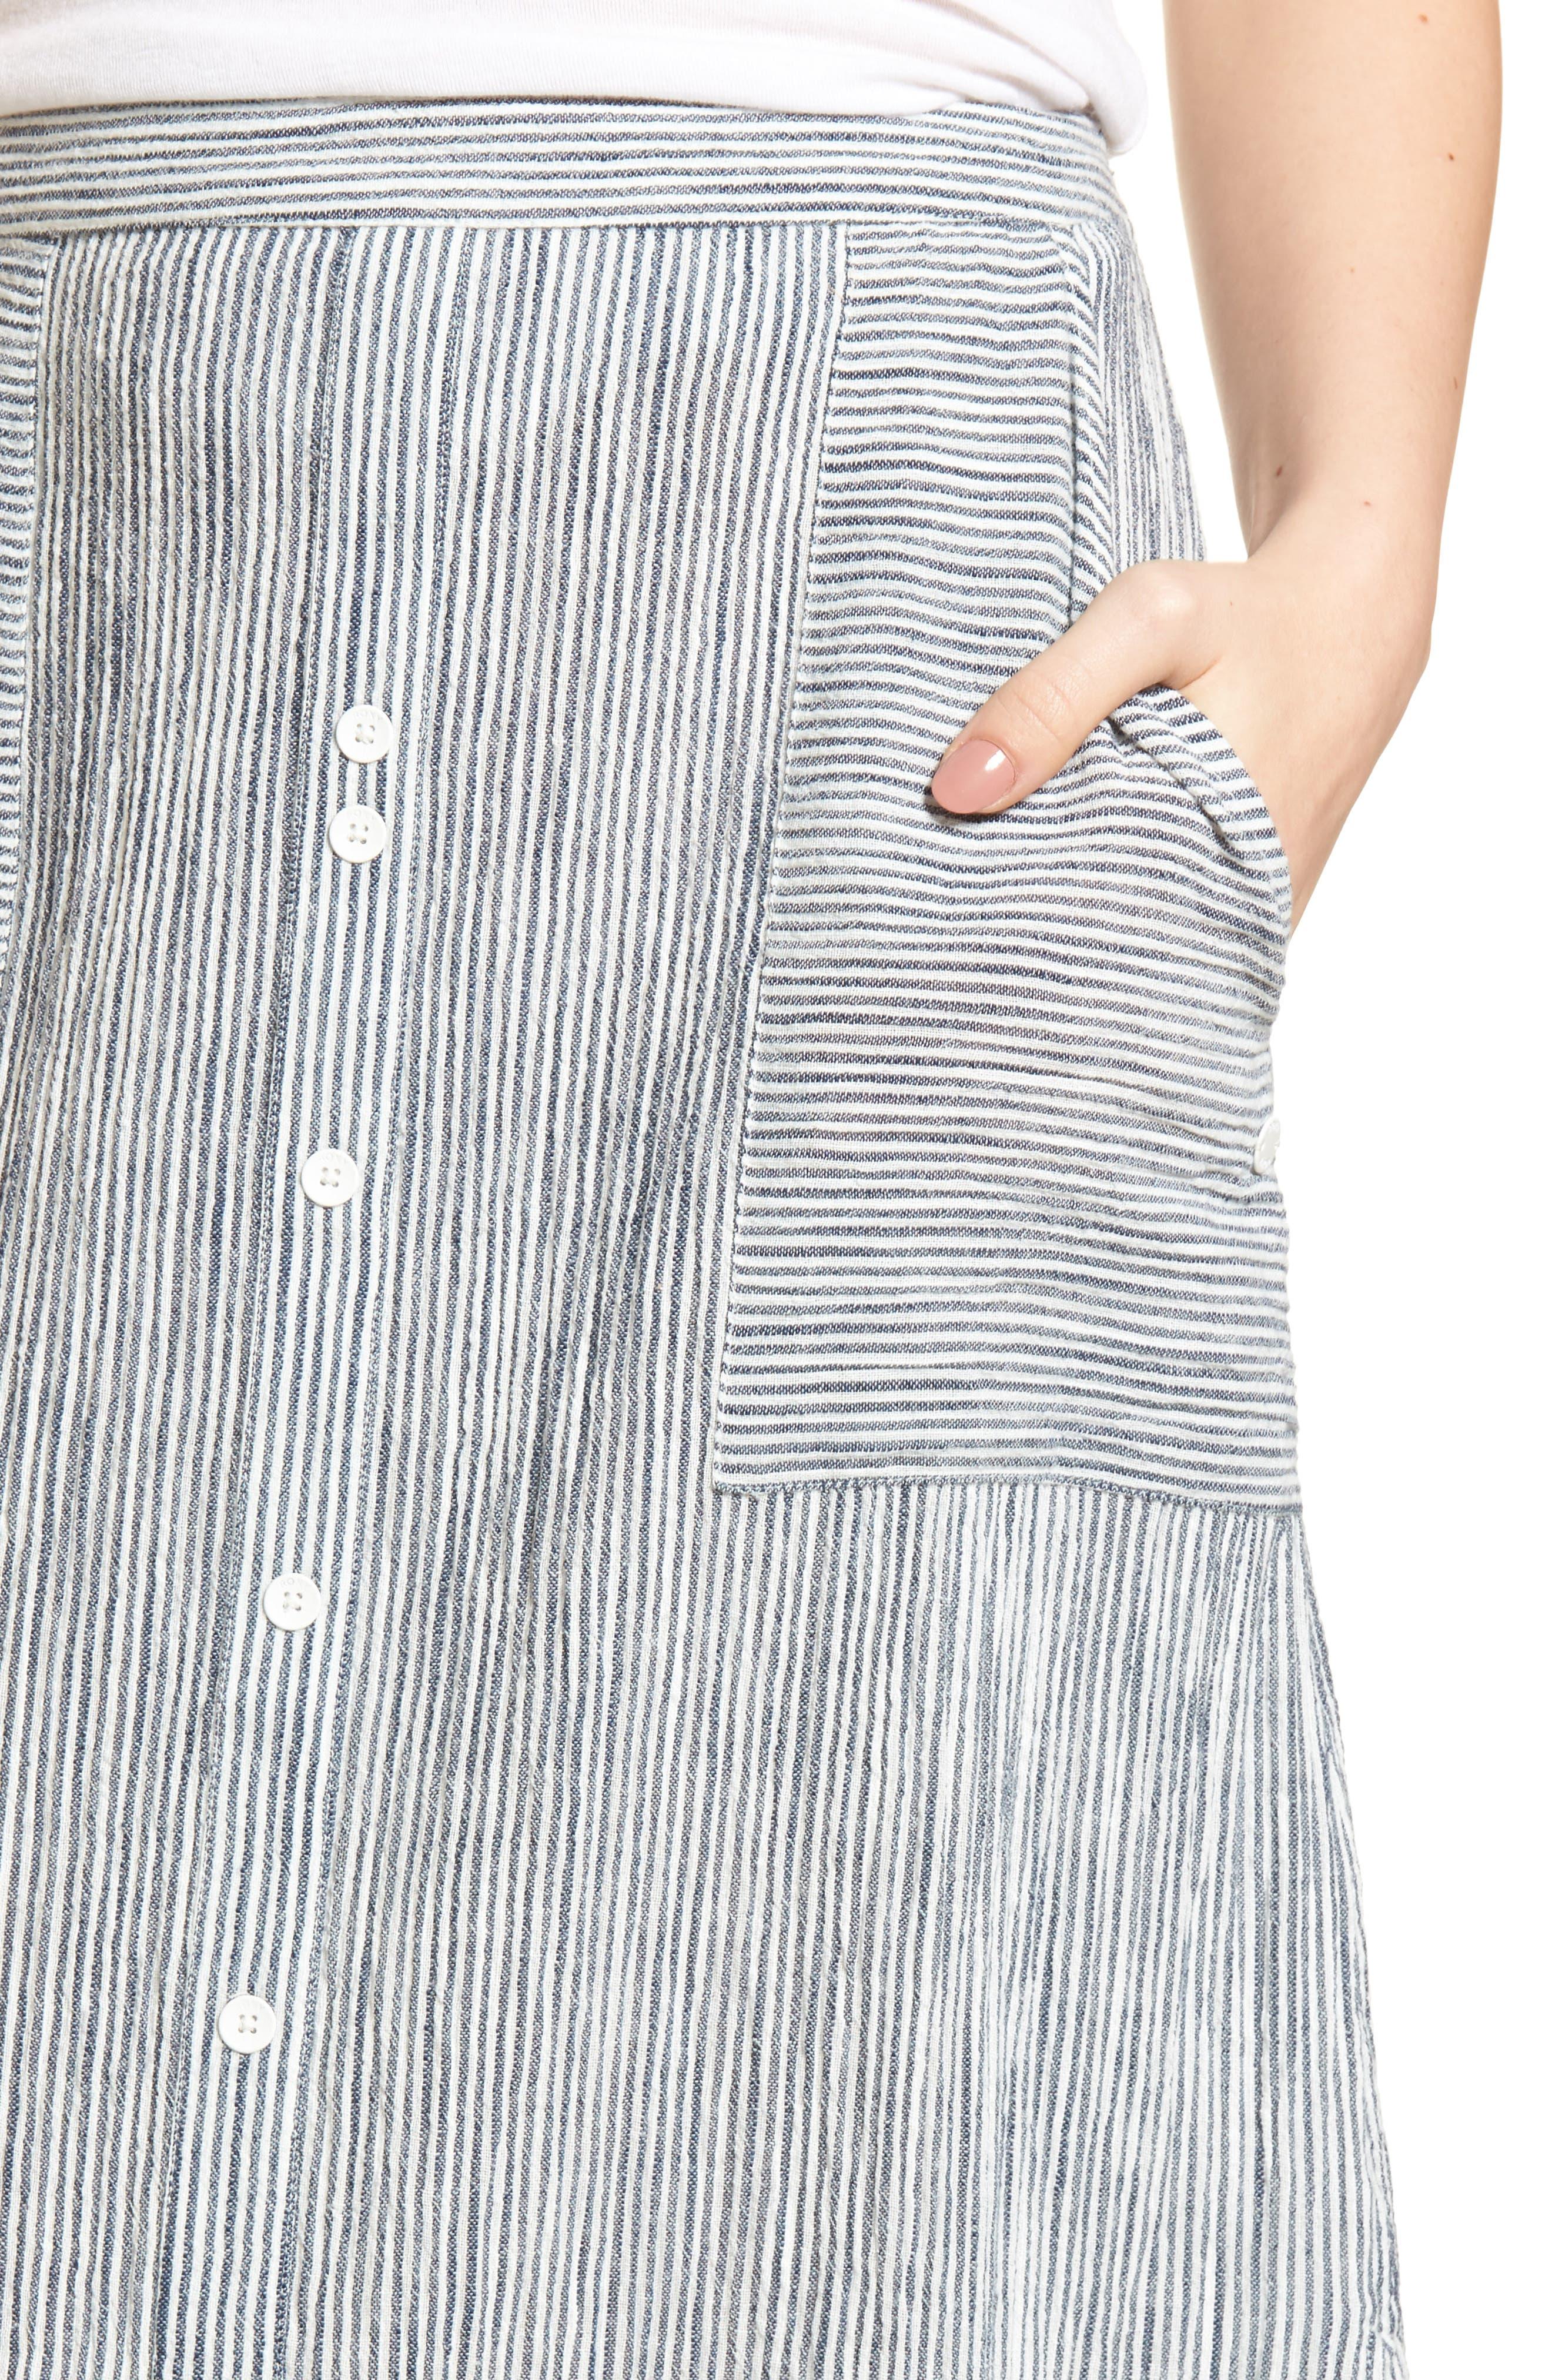 Sunset Islands Pinstripe Maxi Skirt,                             Alternate thumbnail 4, color,                             101